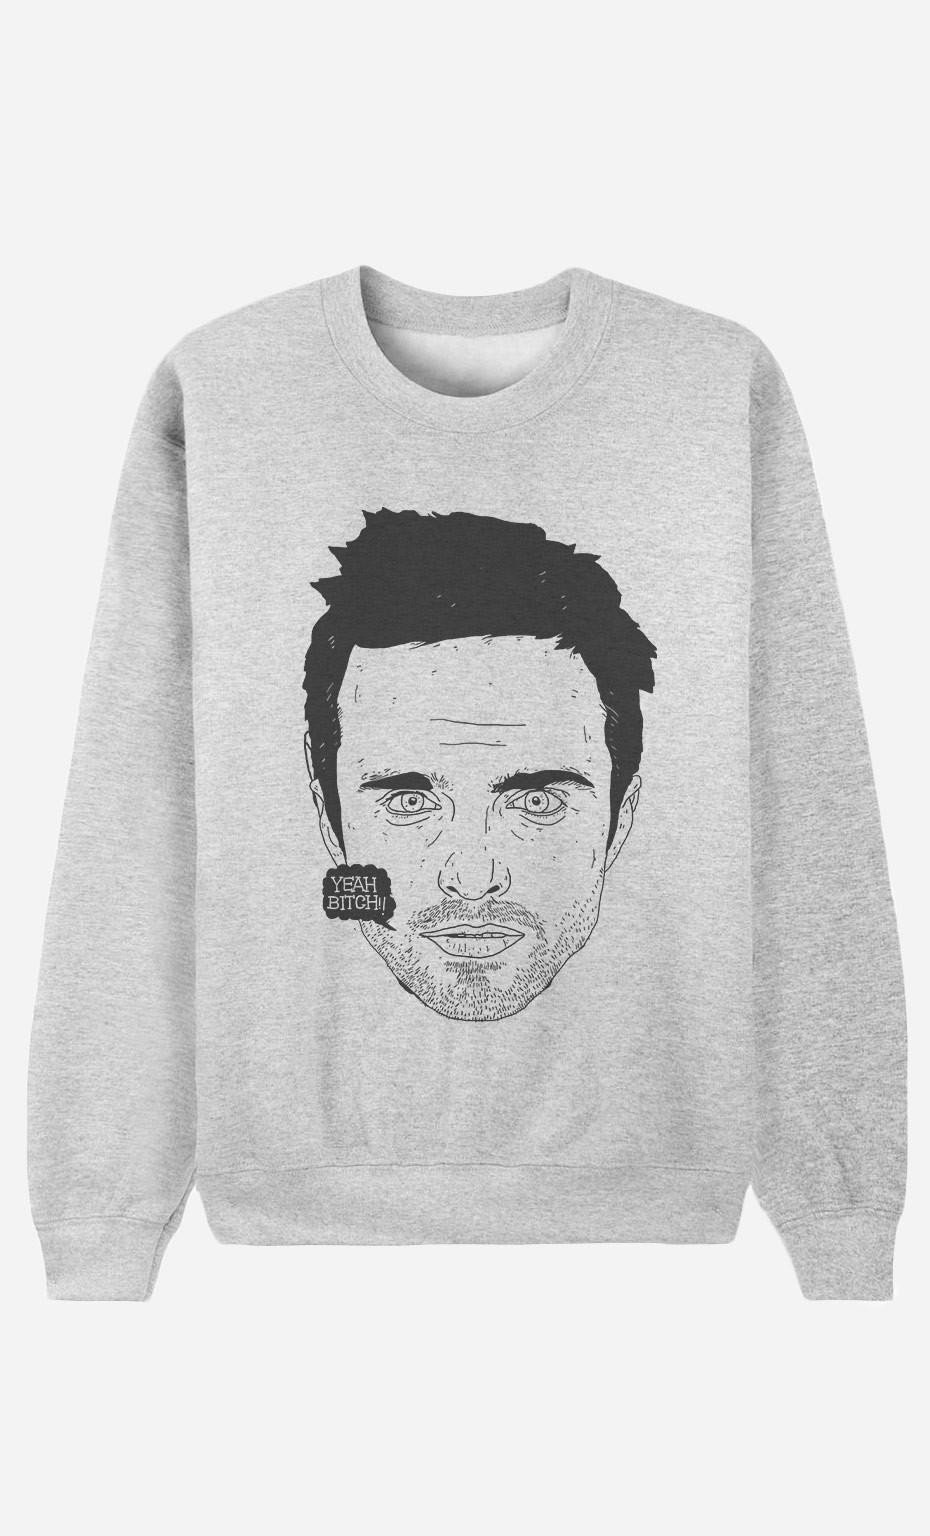 Sweatshirt Jesse Pinkman